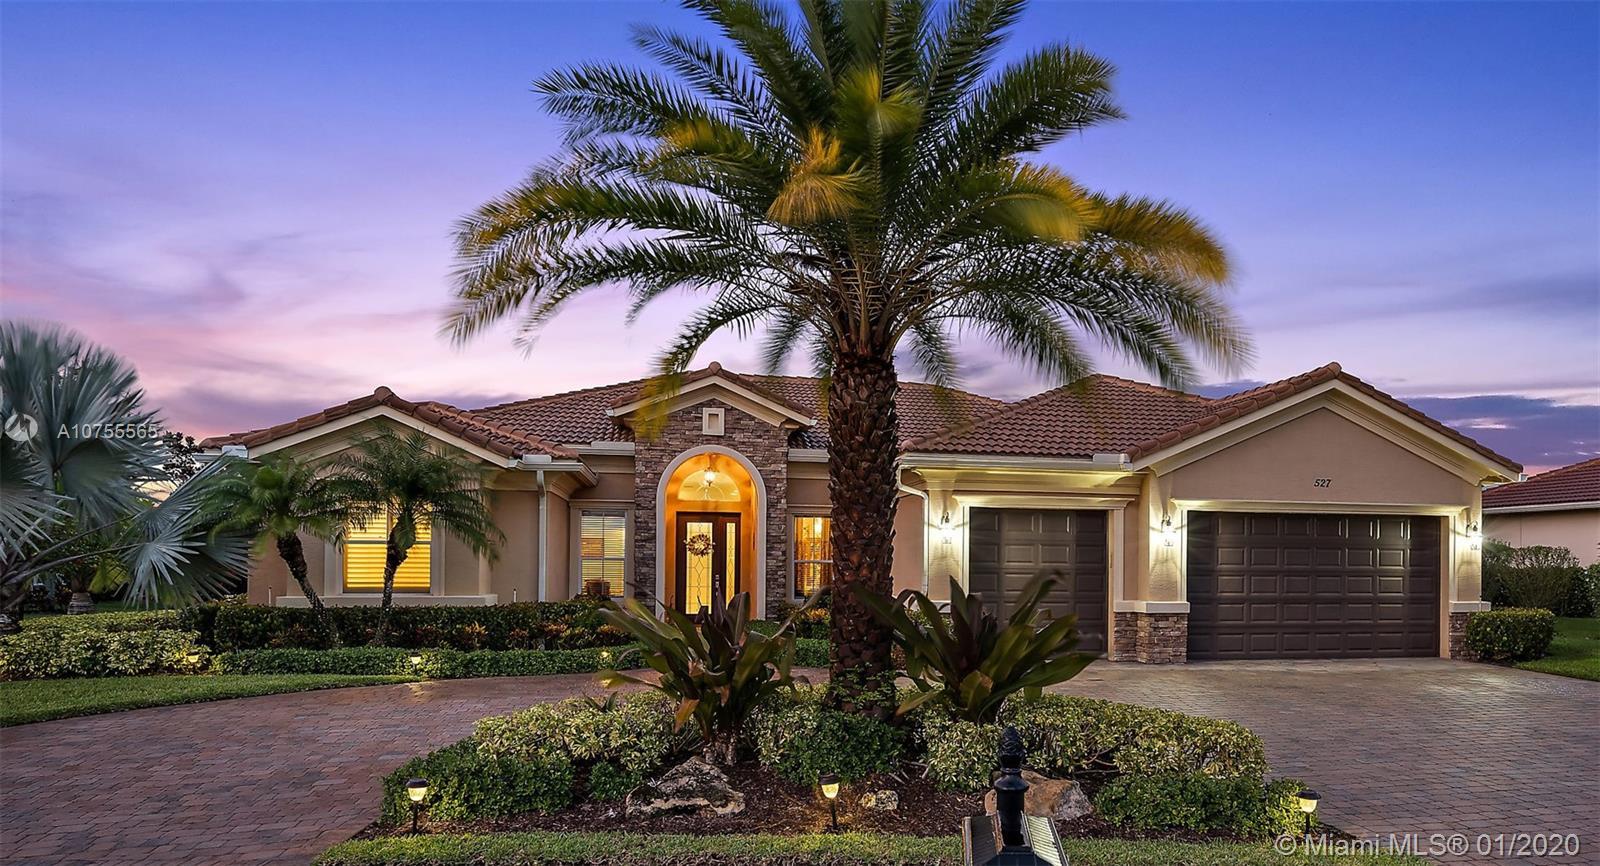 527 SE Tres Belle Cir, Stuart, FL 34997 - Stuart, FL real estate listing